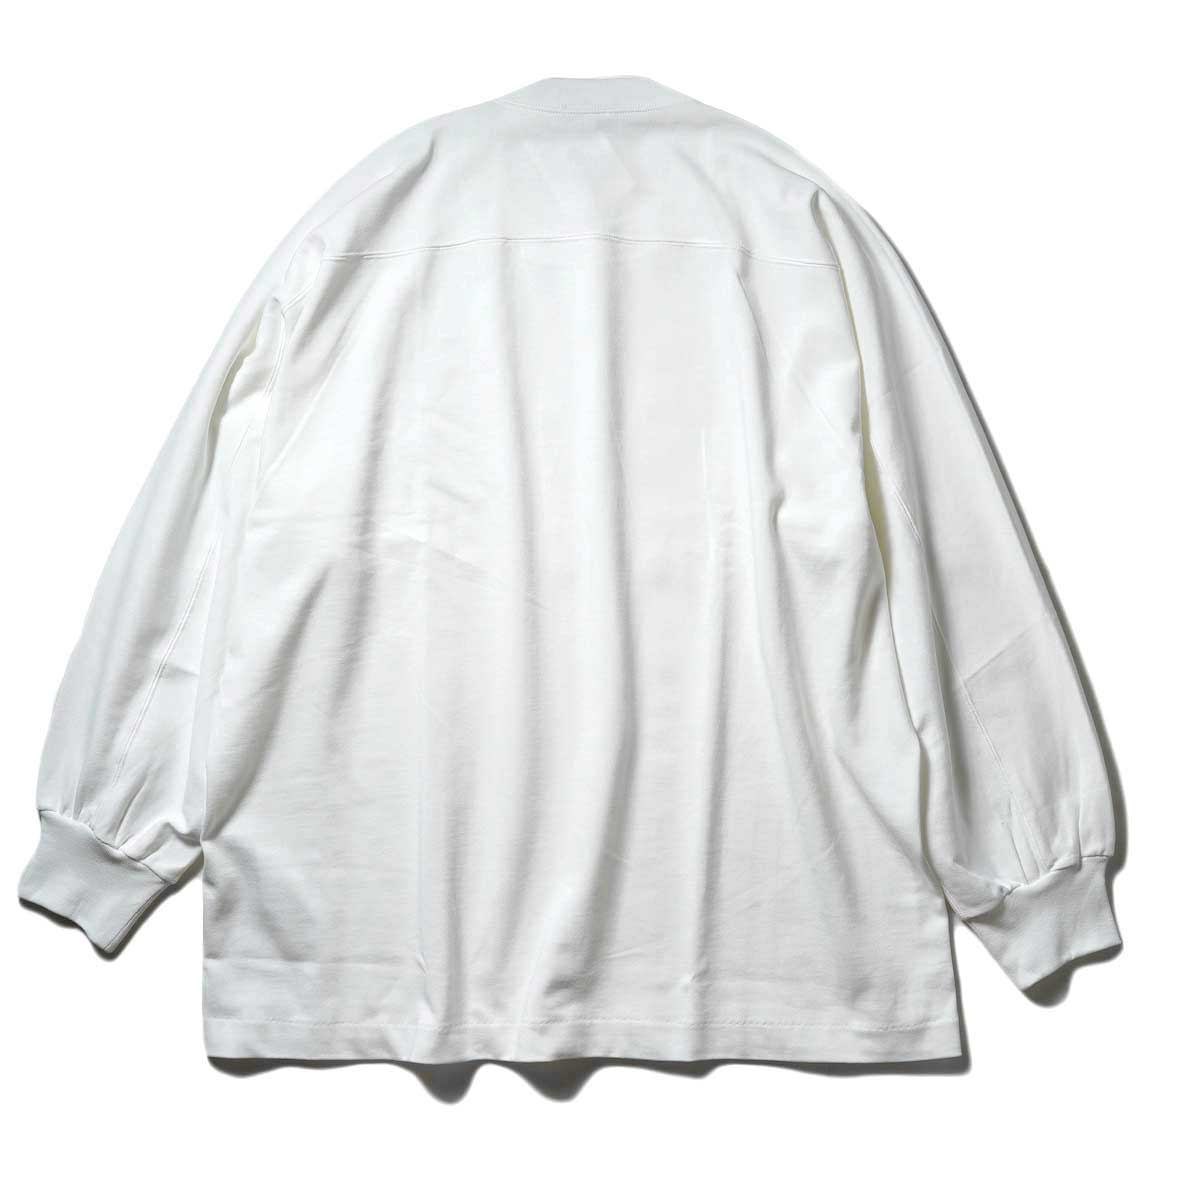 YLEVE / TWIST YARN COTTON BIG P/O (White) 背面